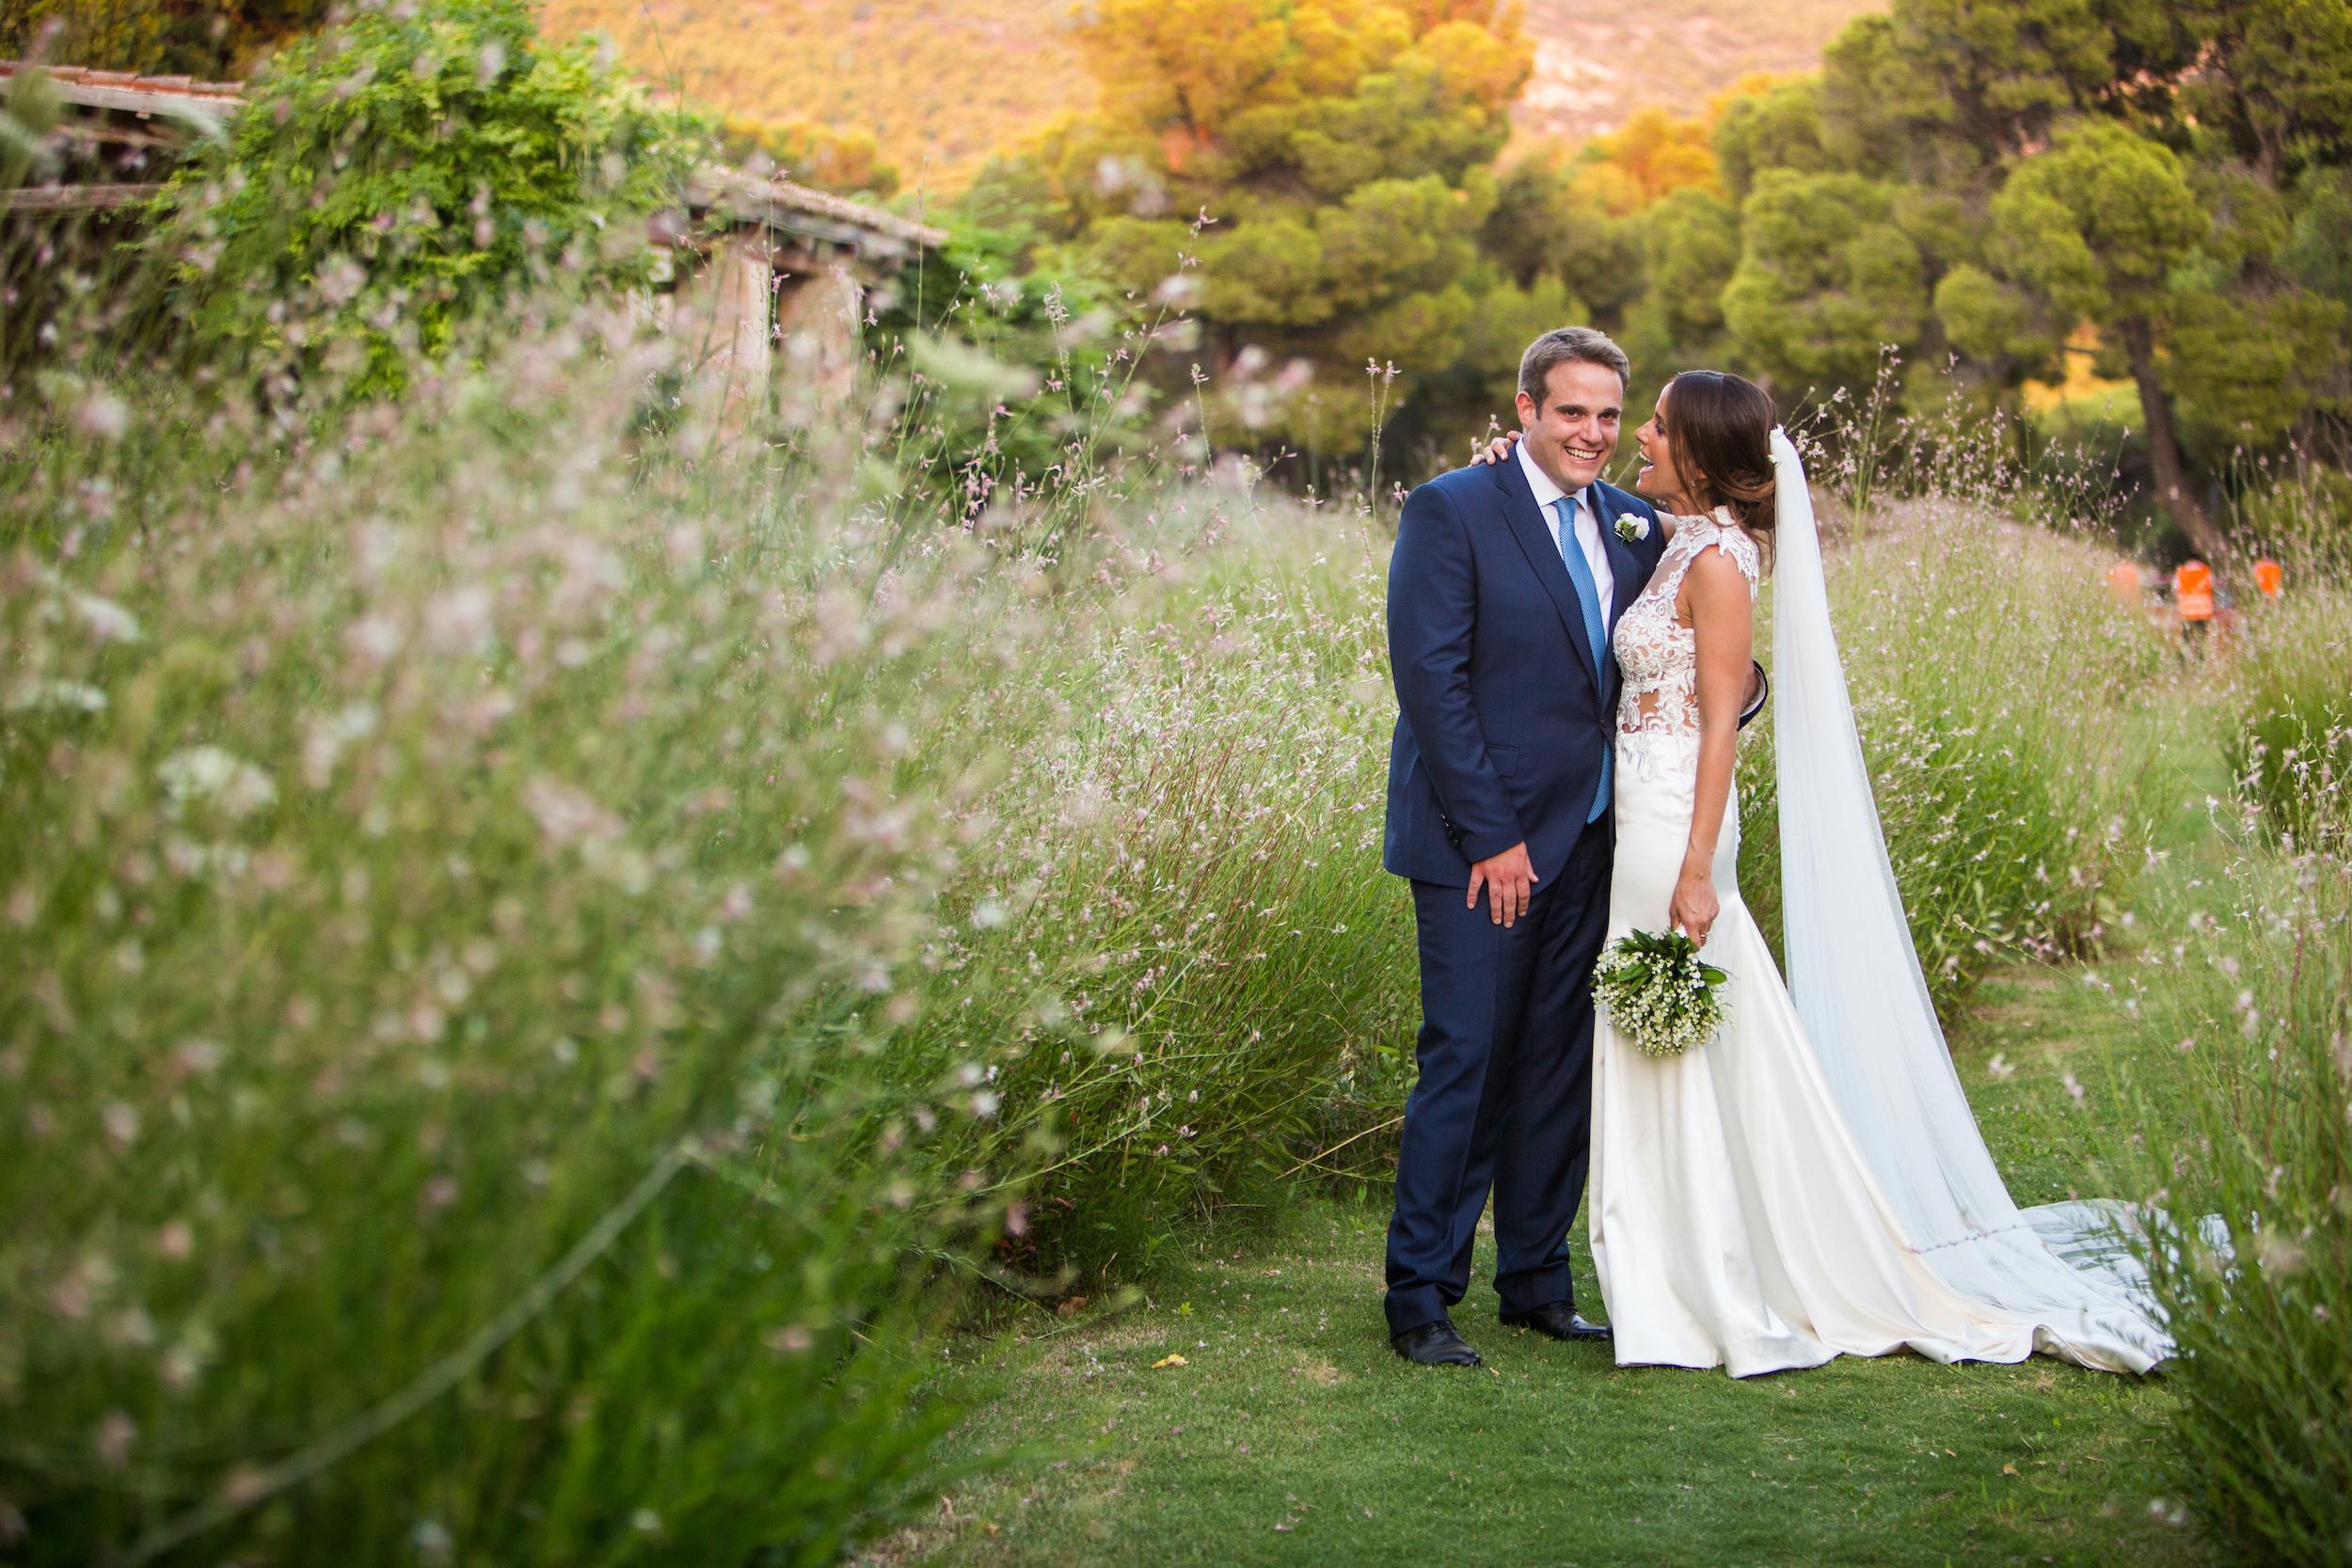 P&N Sinterina wedding - Image 10